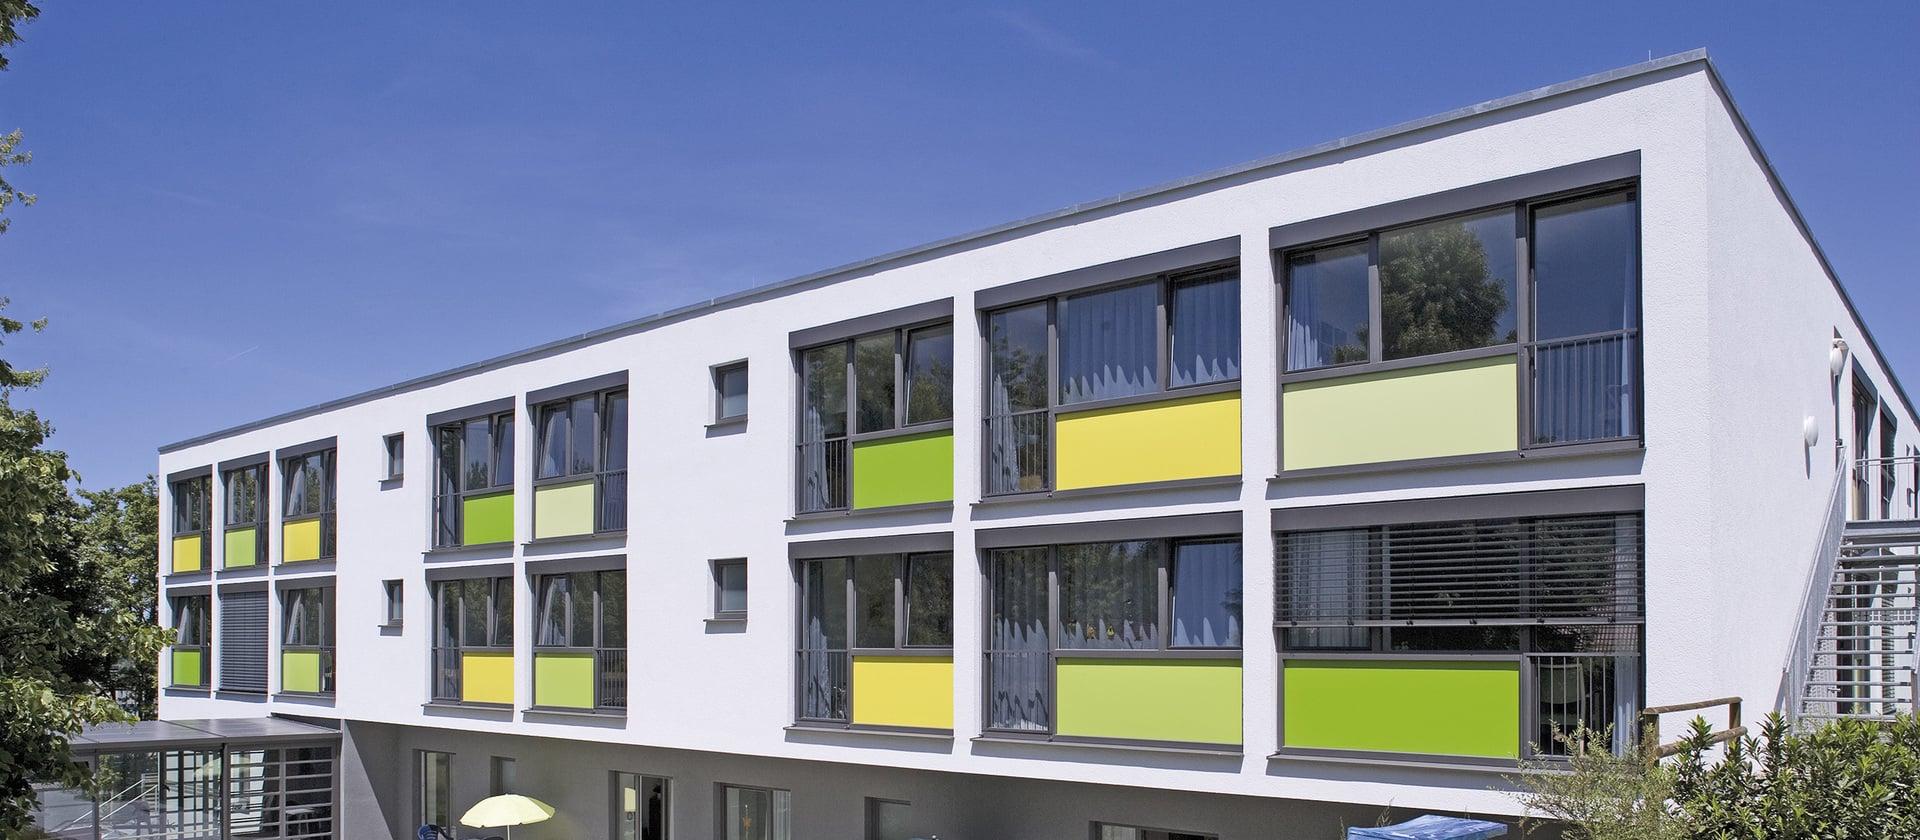 Ventajas e inconvenientes de las ventanas de aluminio y for Ventanas de pvc ventajas y desventajas